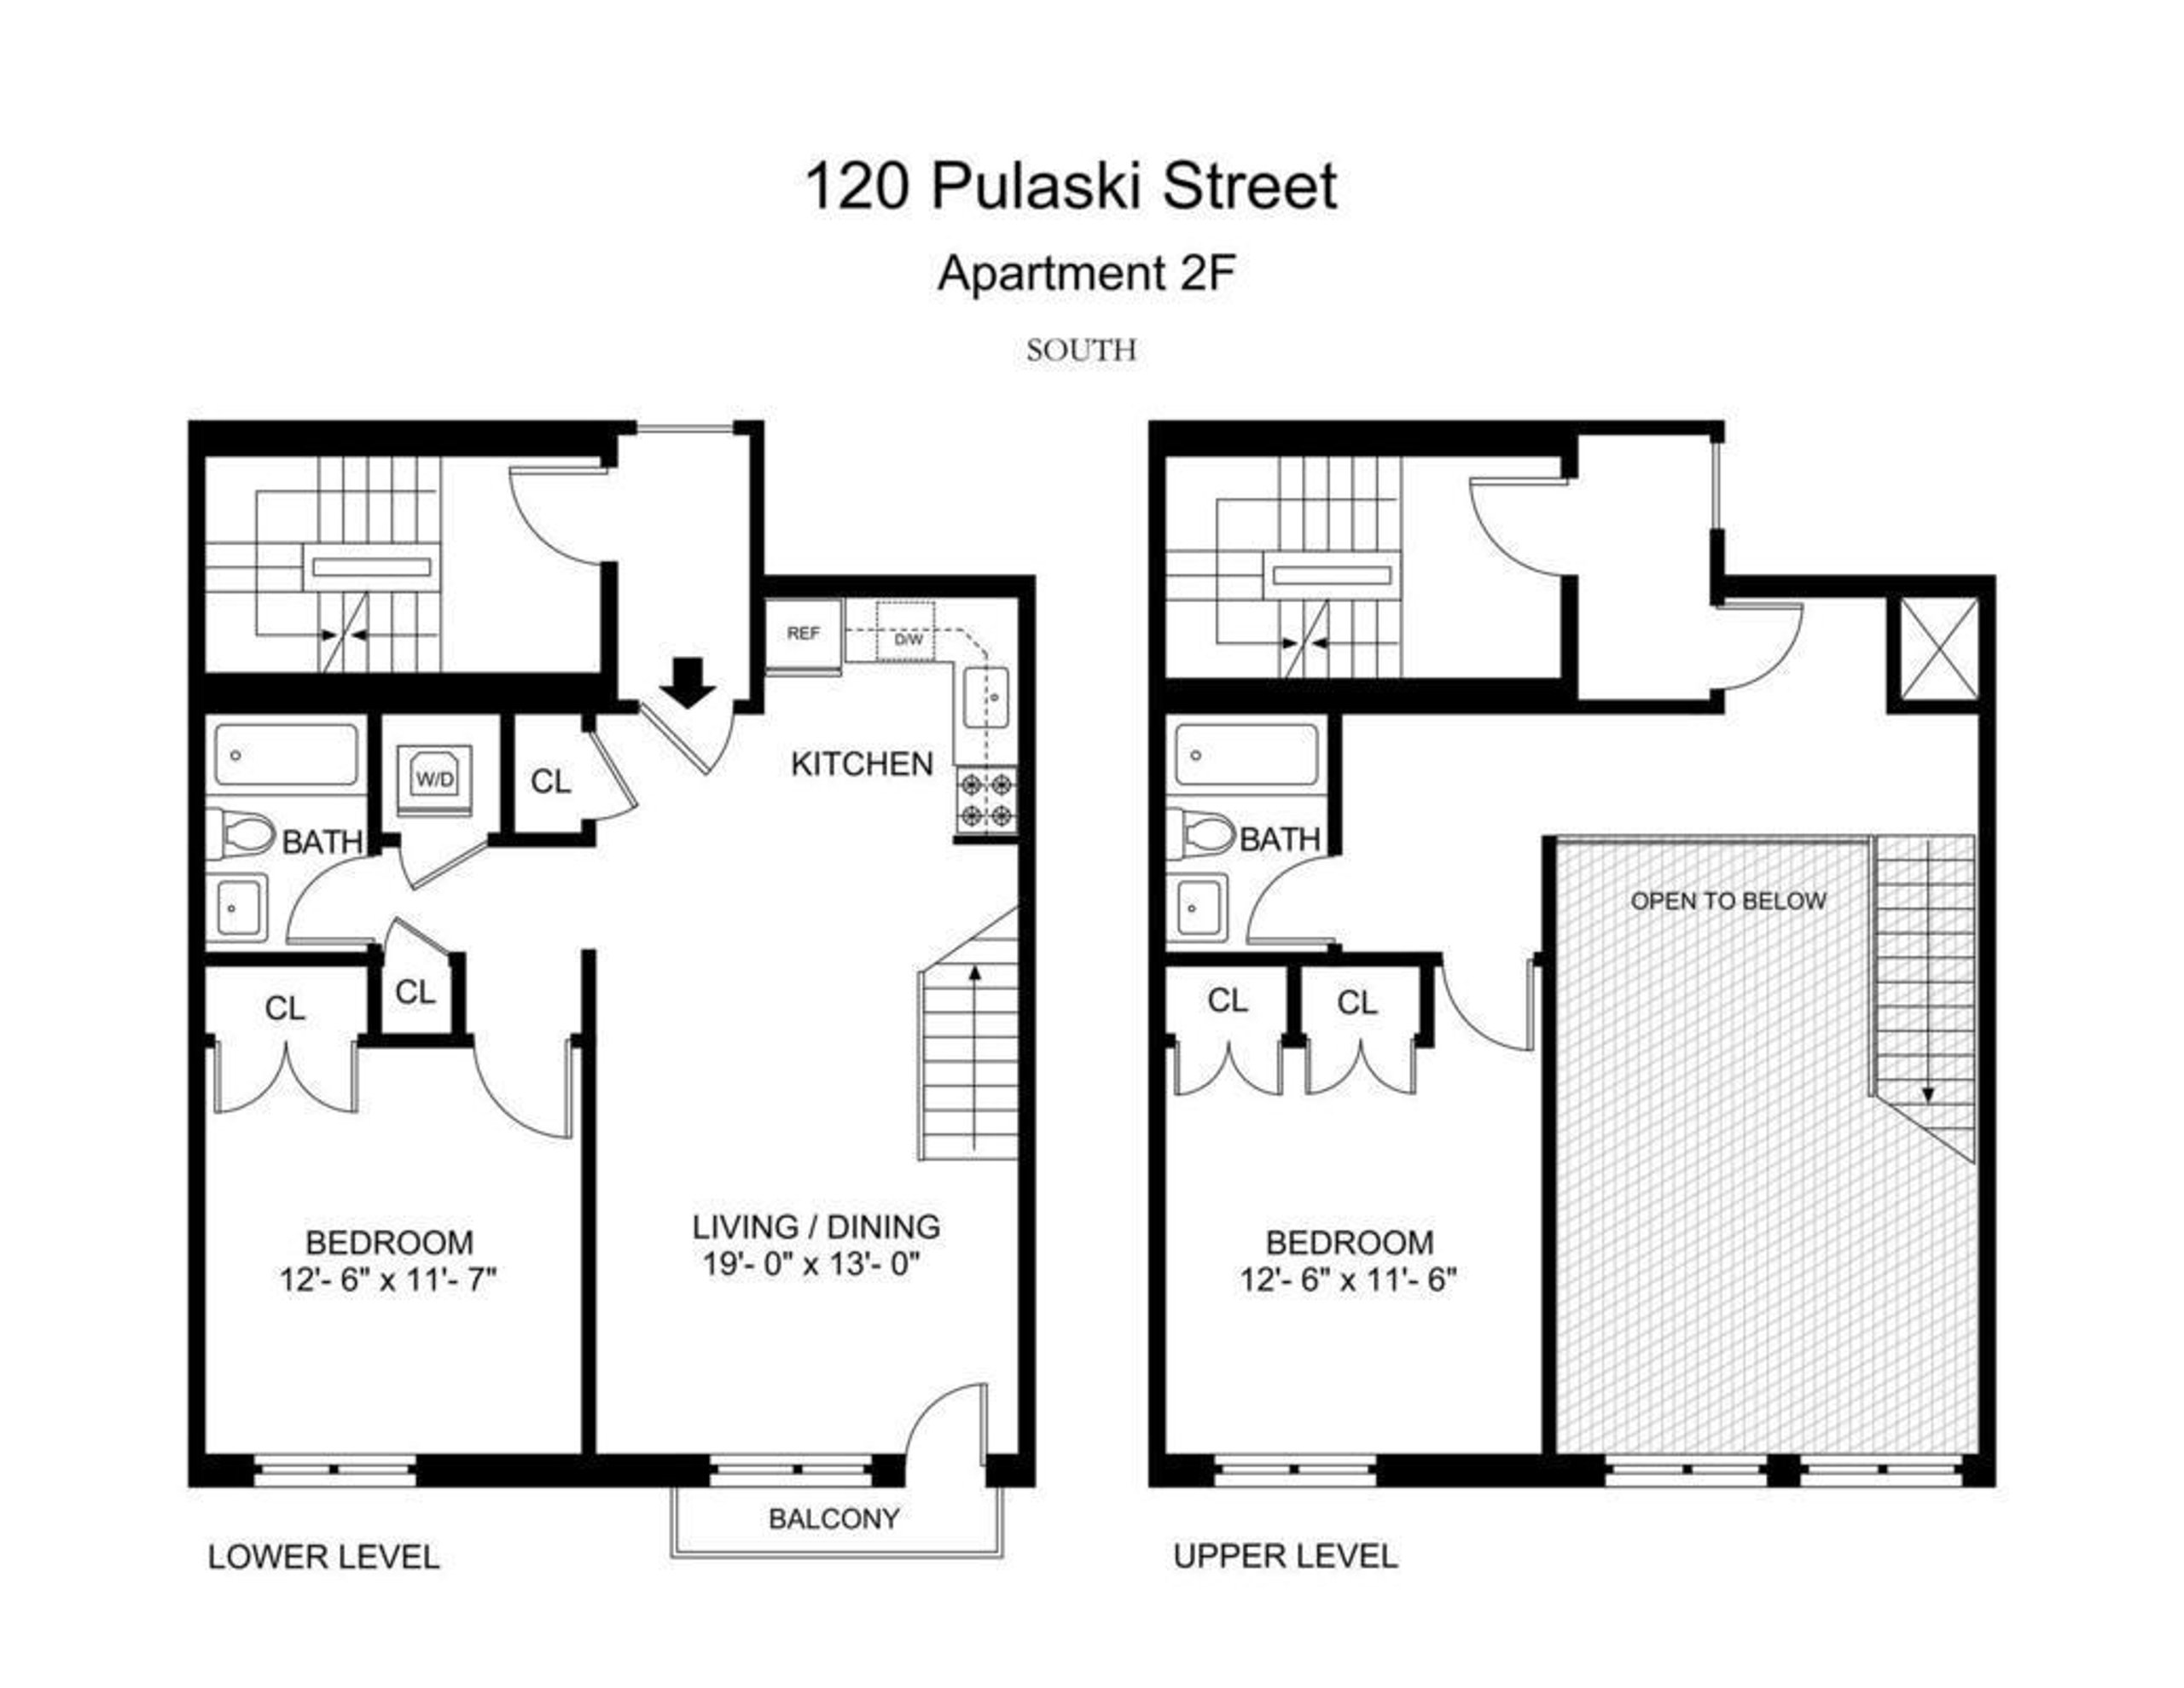 13x12 Bedroom self storage unit